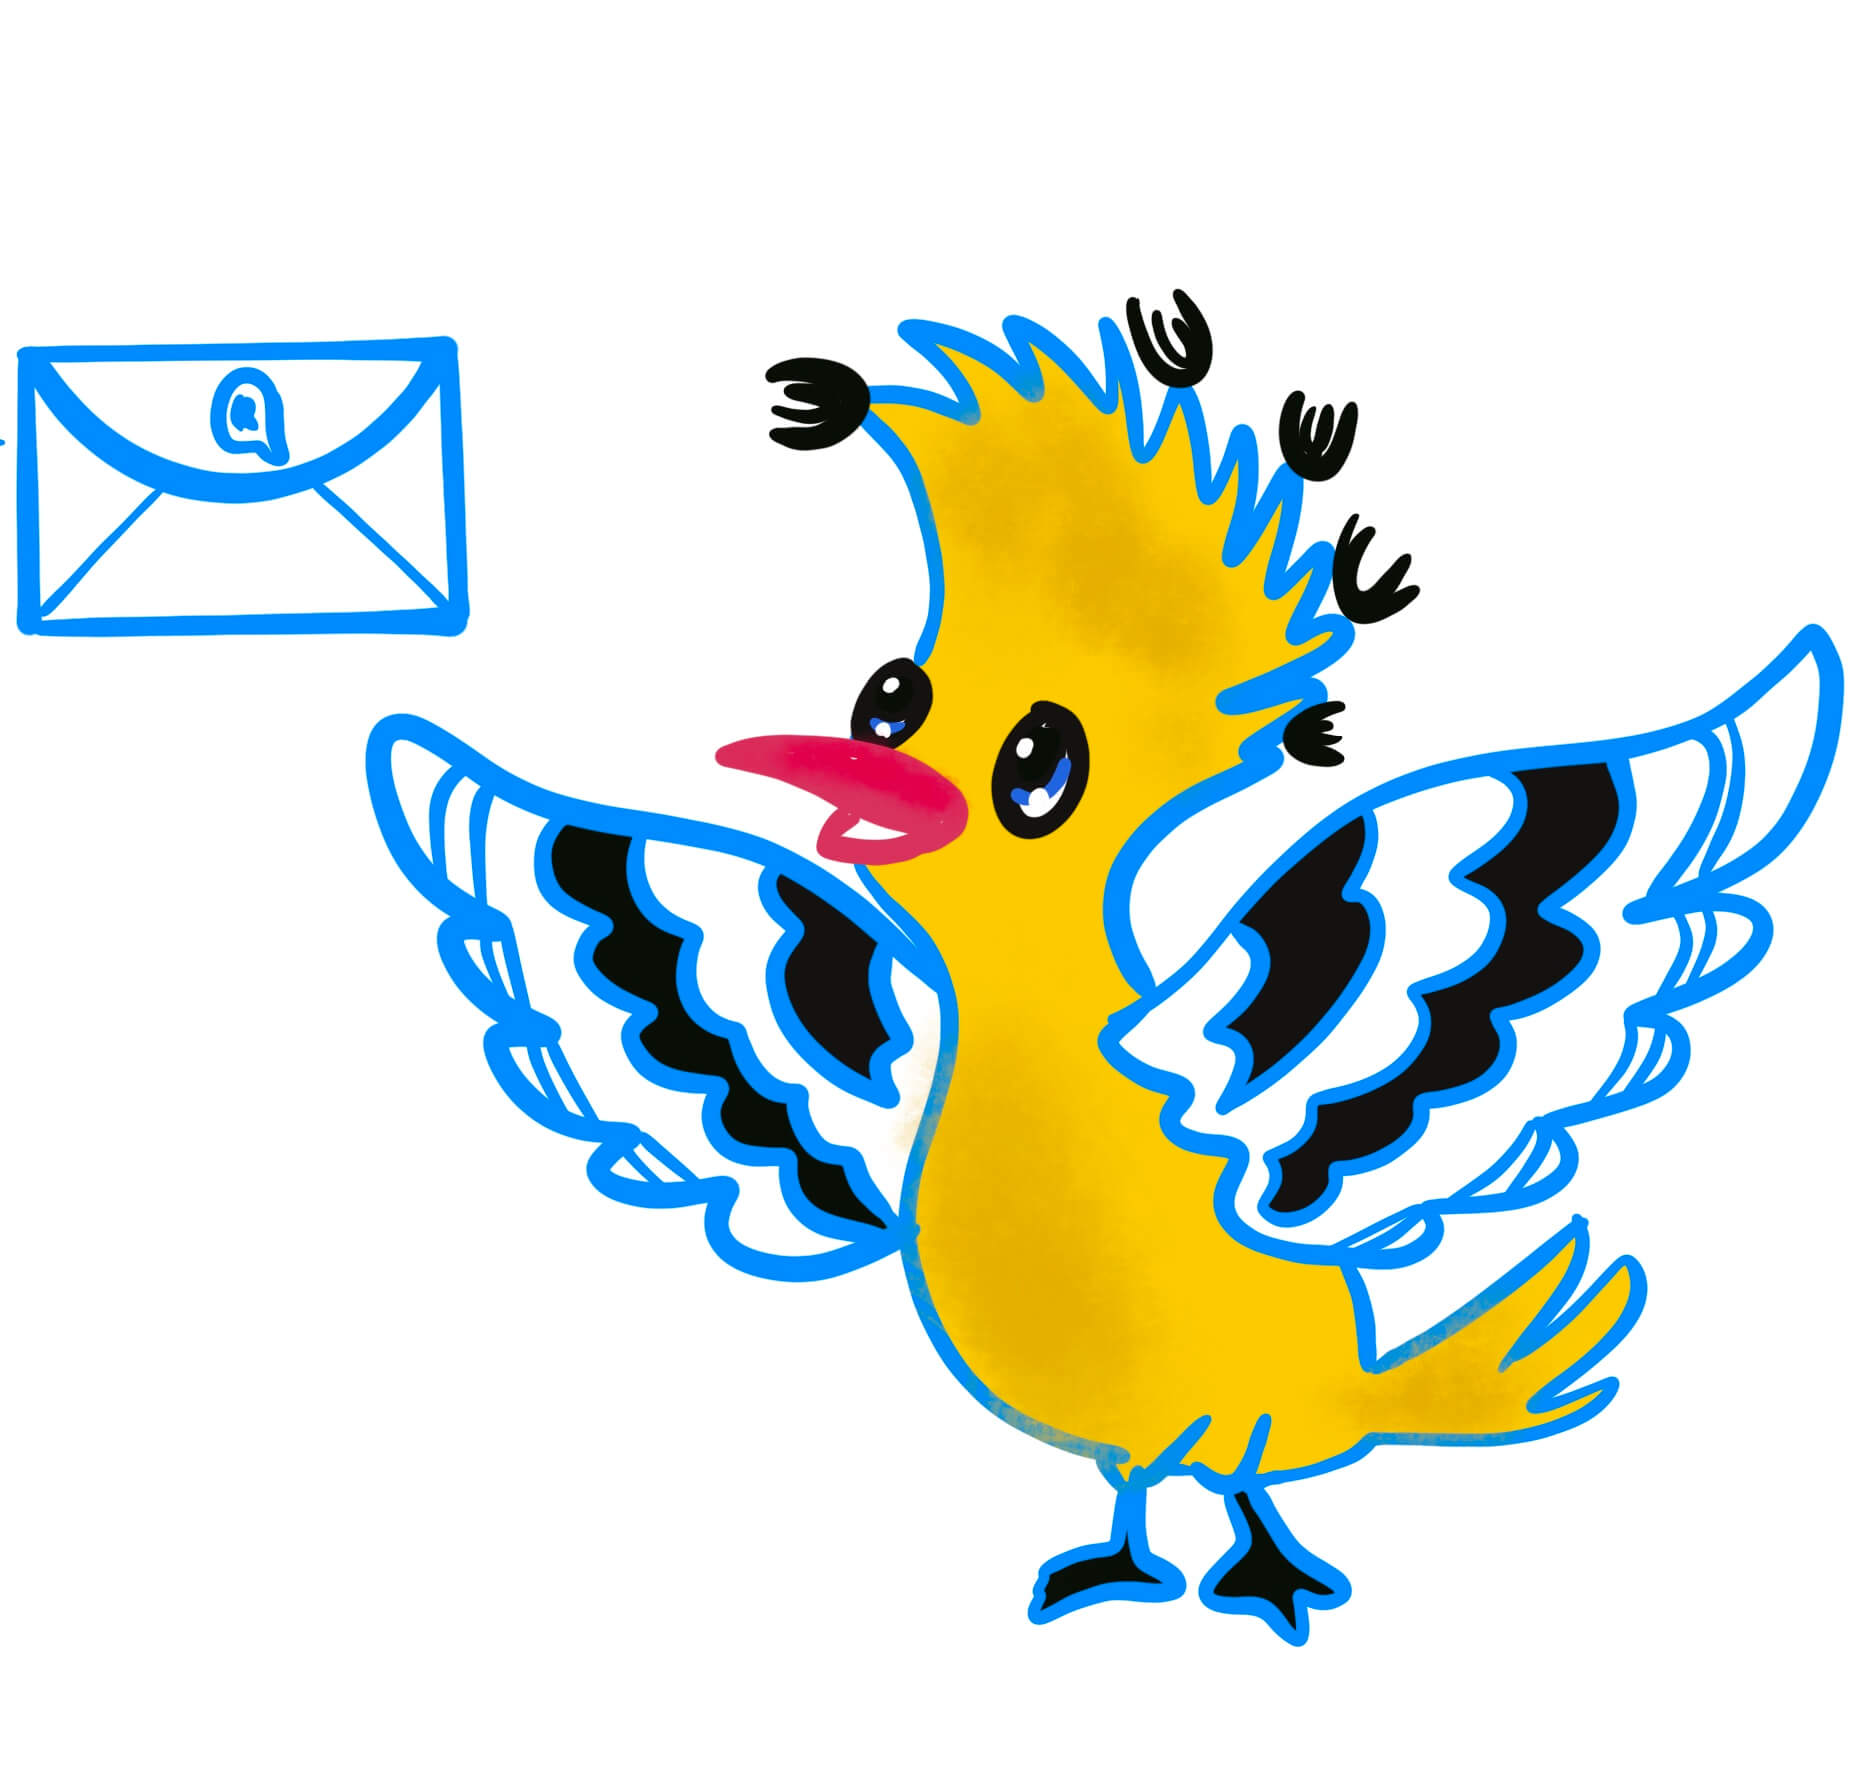 Mail udod fqsl